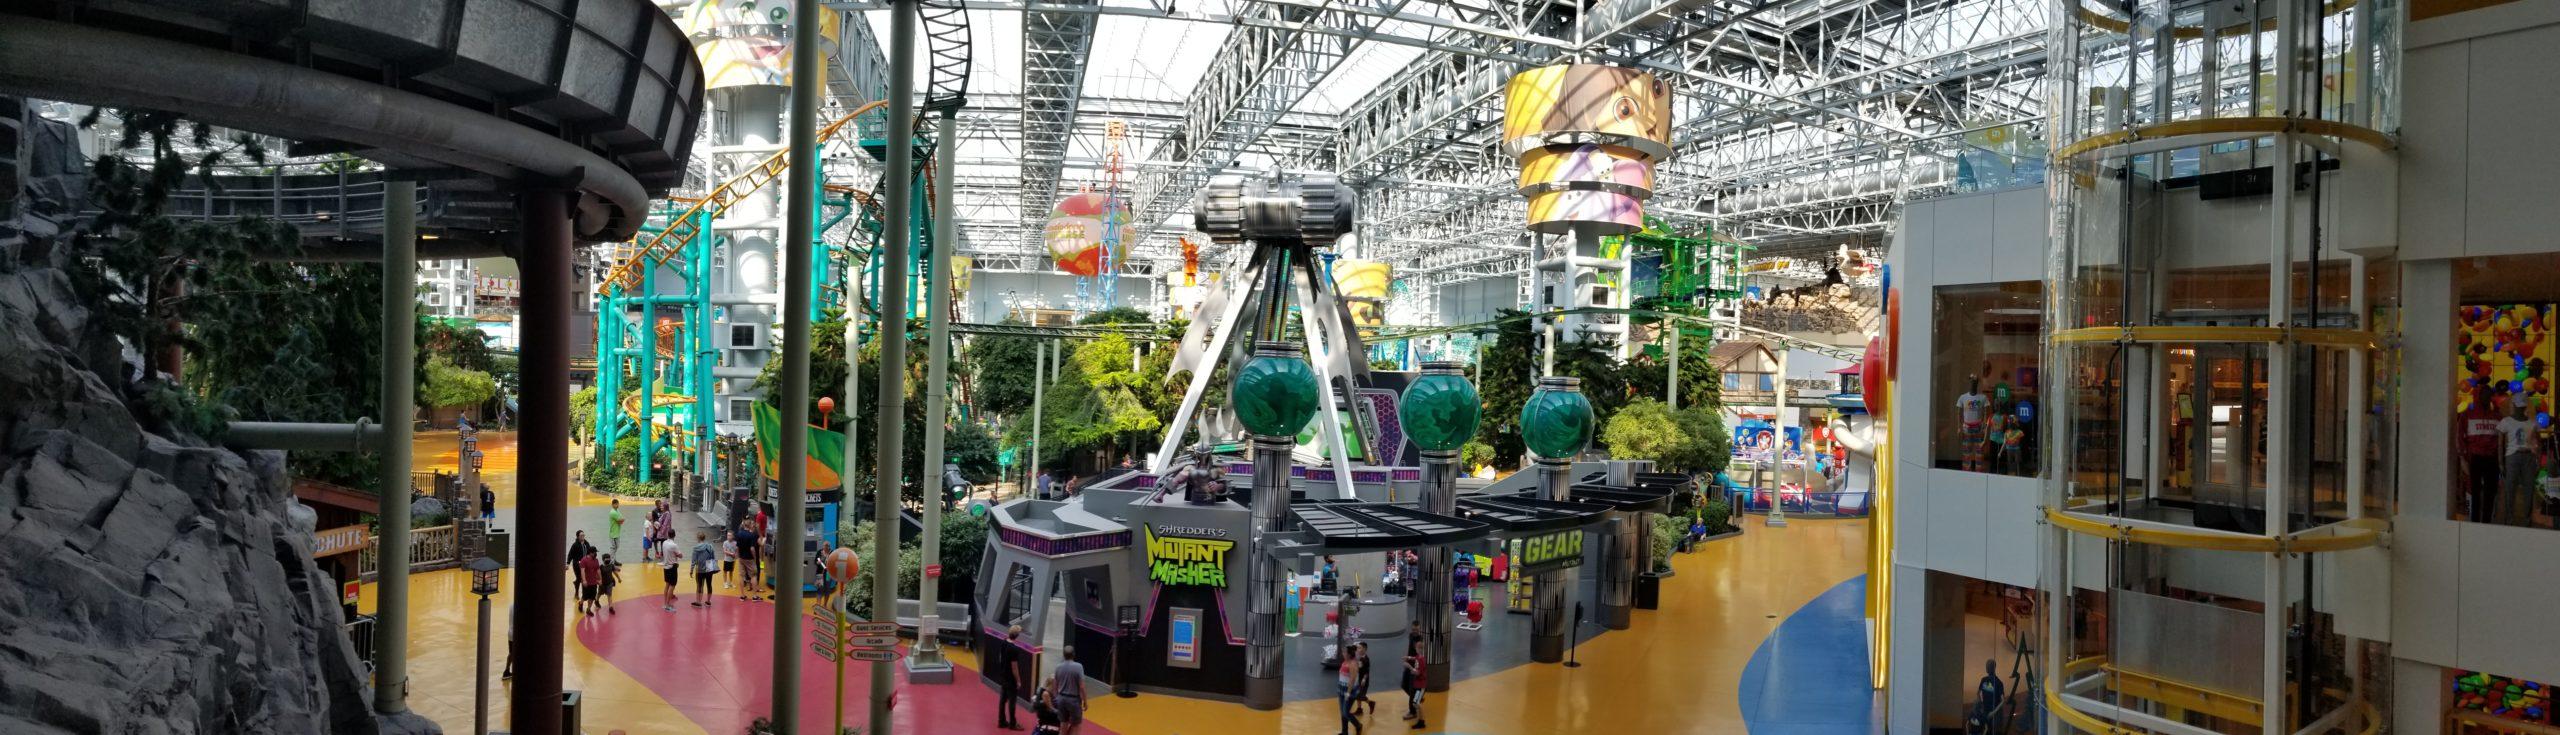 Mall of America Theme Park